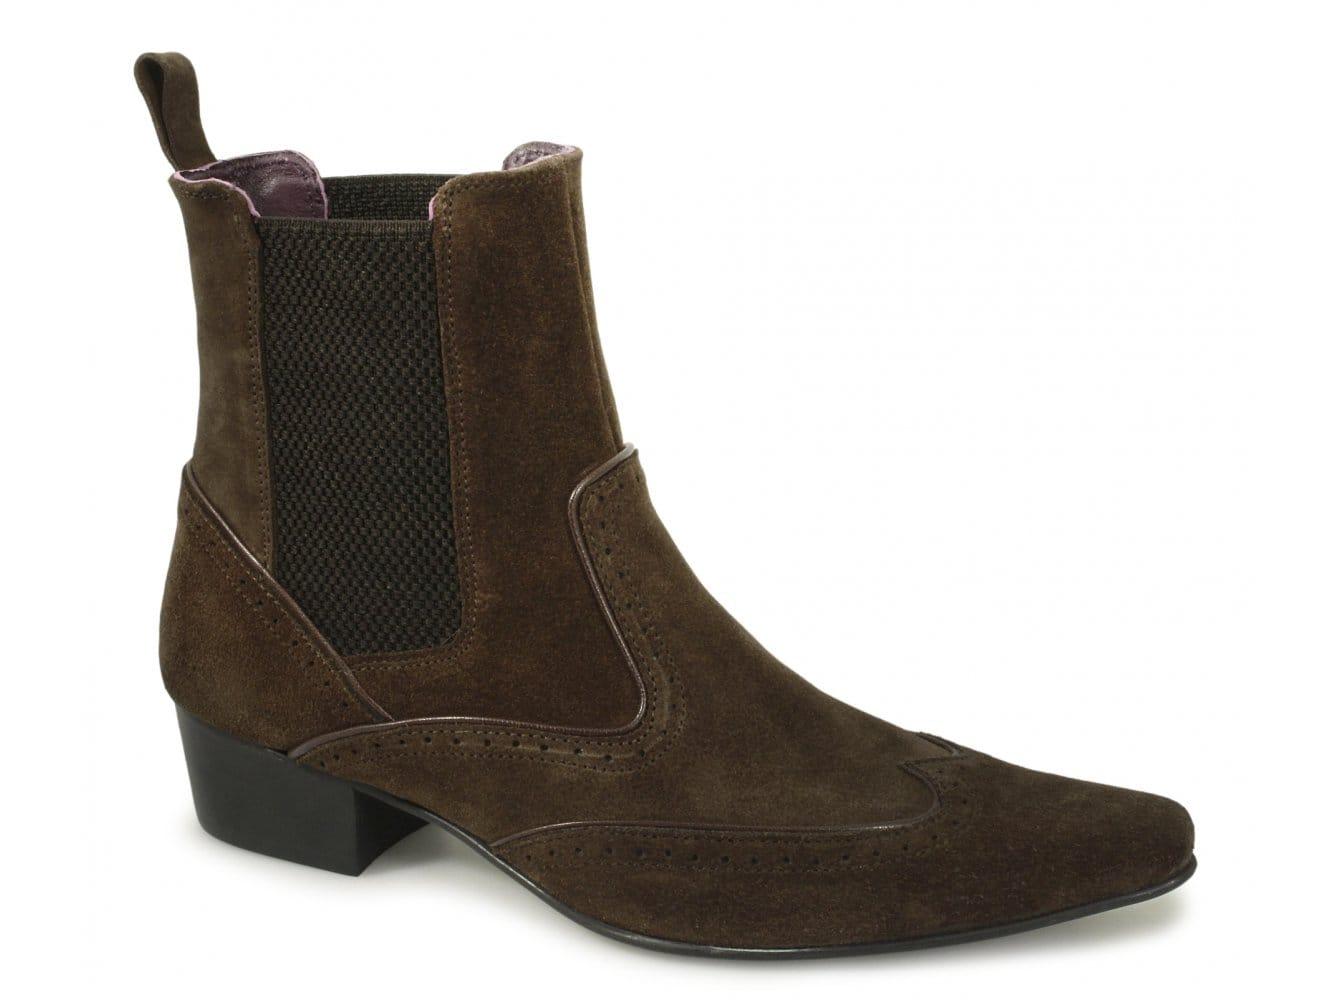 Mens Brown Chelsea Boots Images Banana Repbulic Shoes